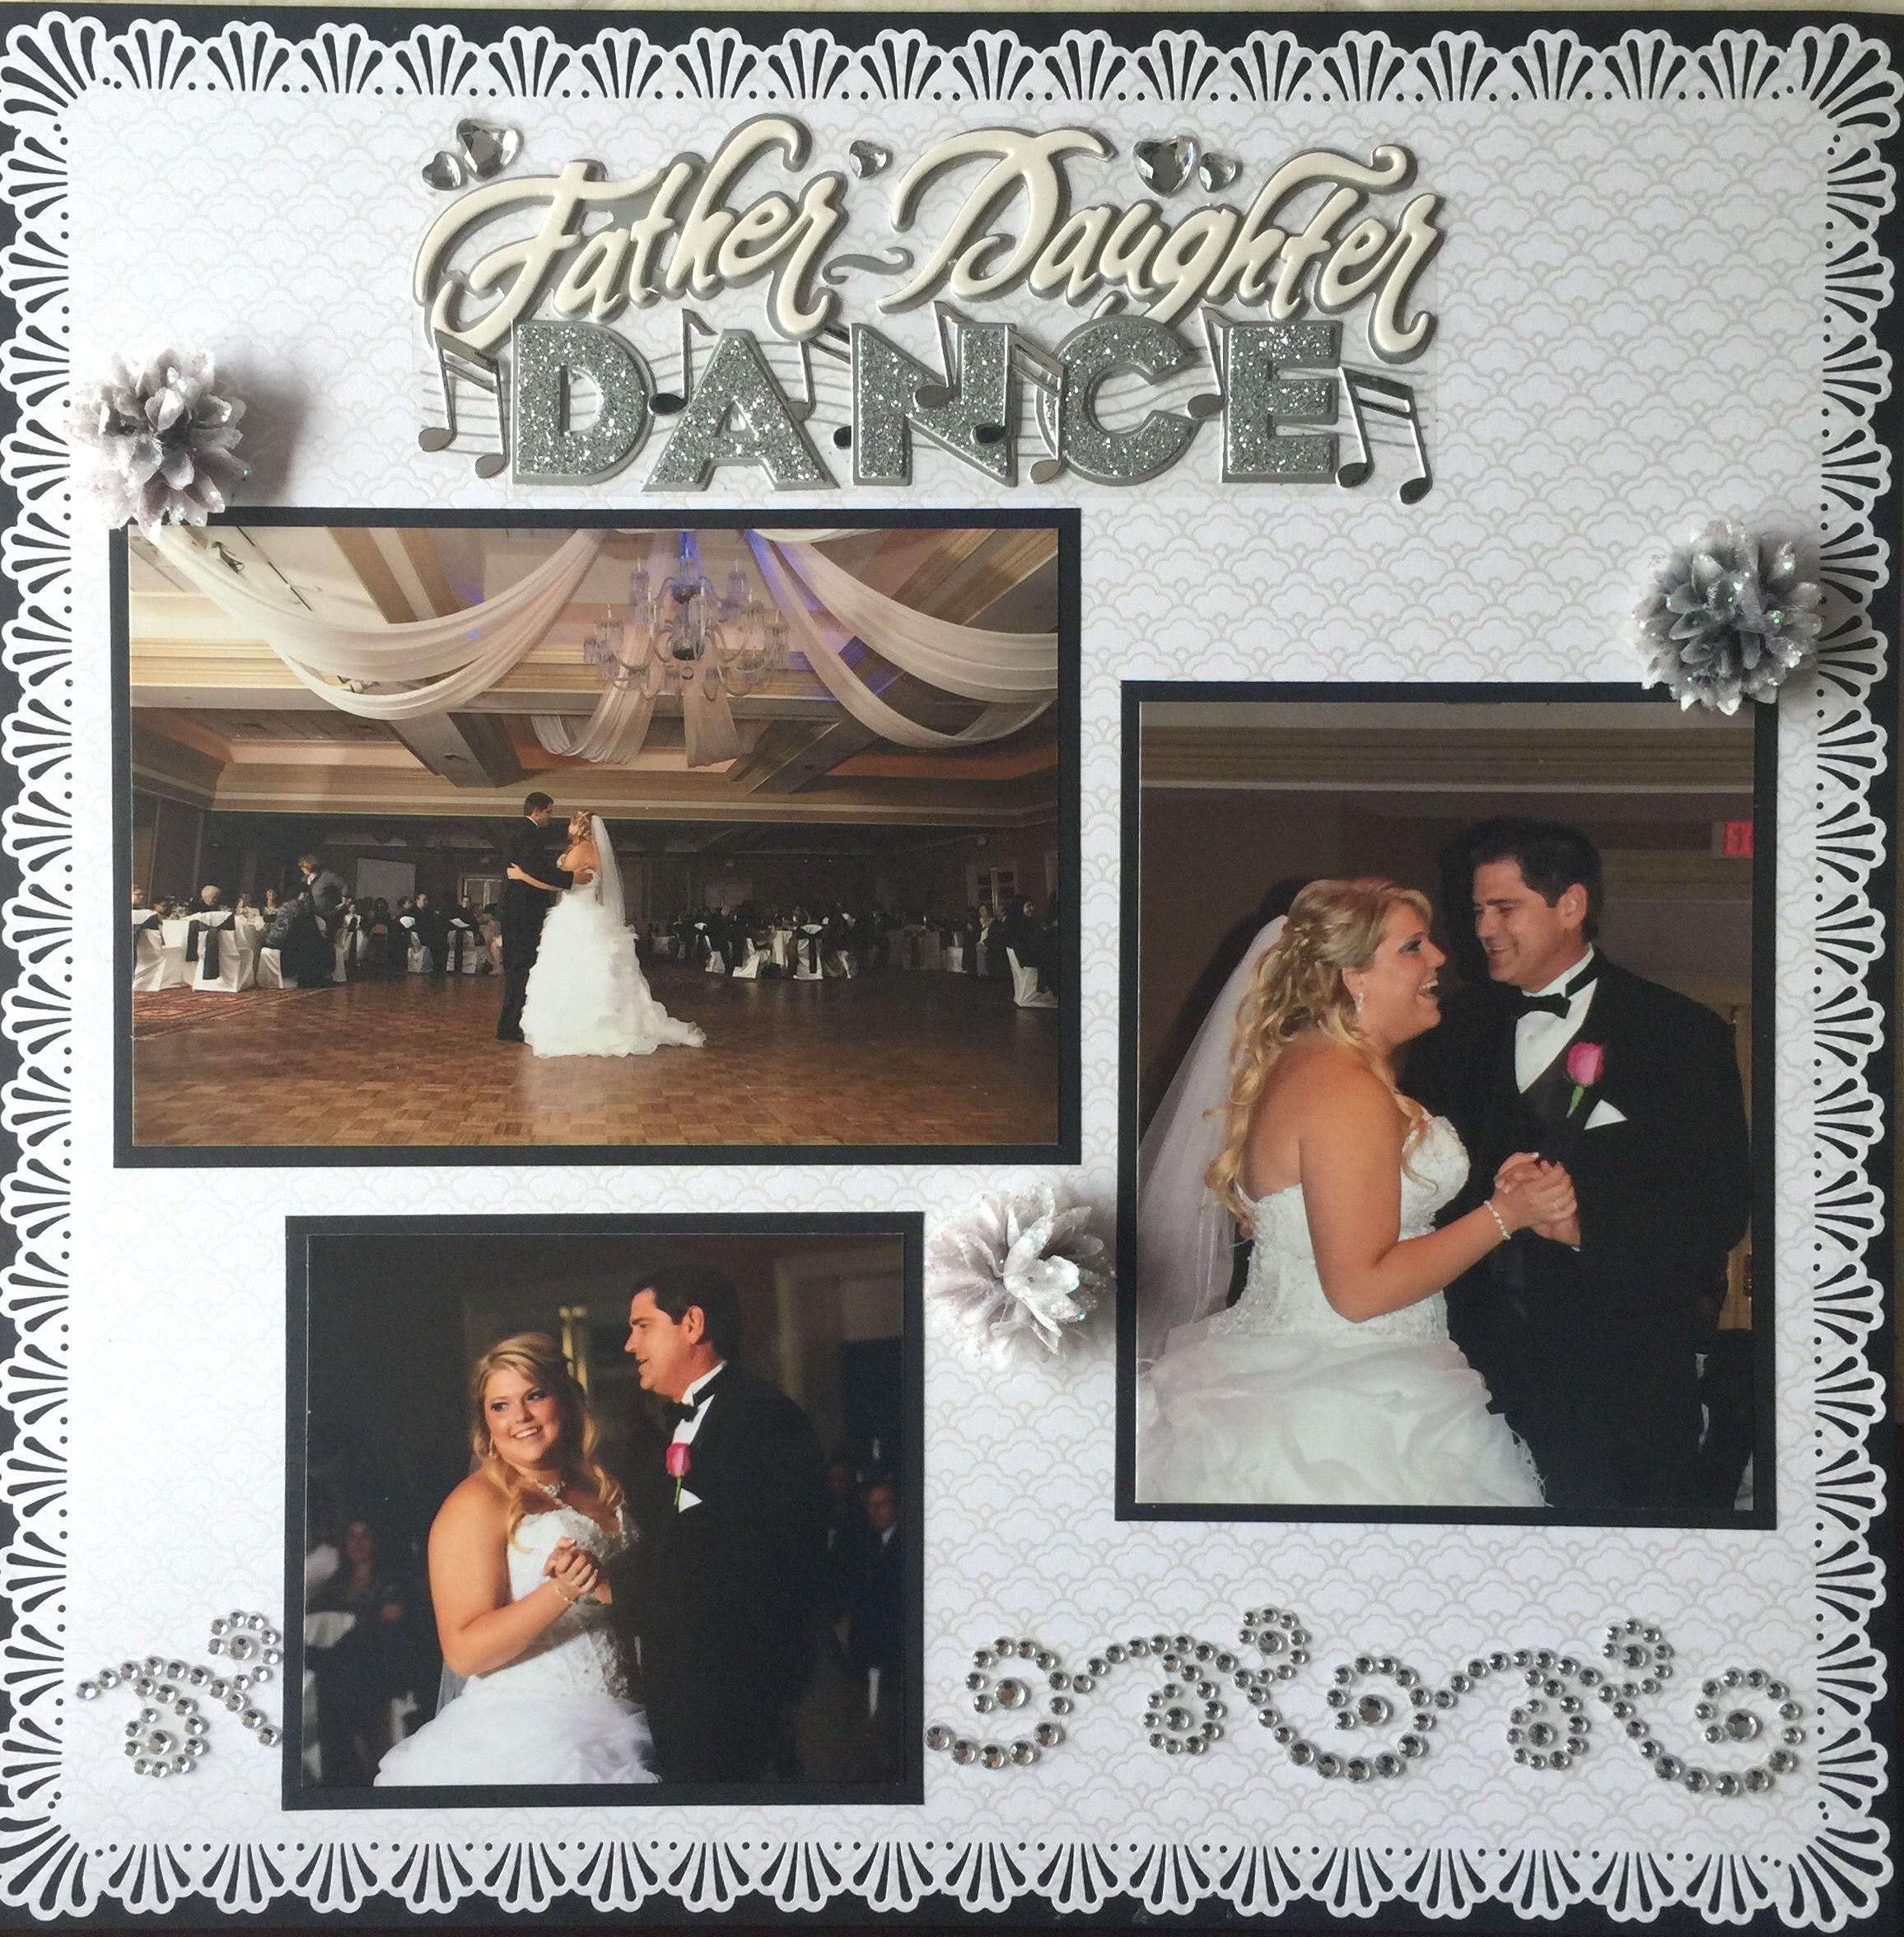 Father Daughter Dance - Wedding Scrapbooking Scrapbook Pages